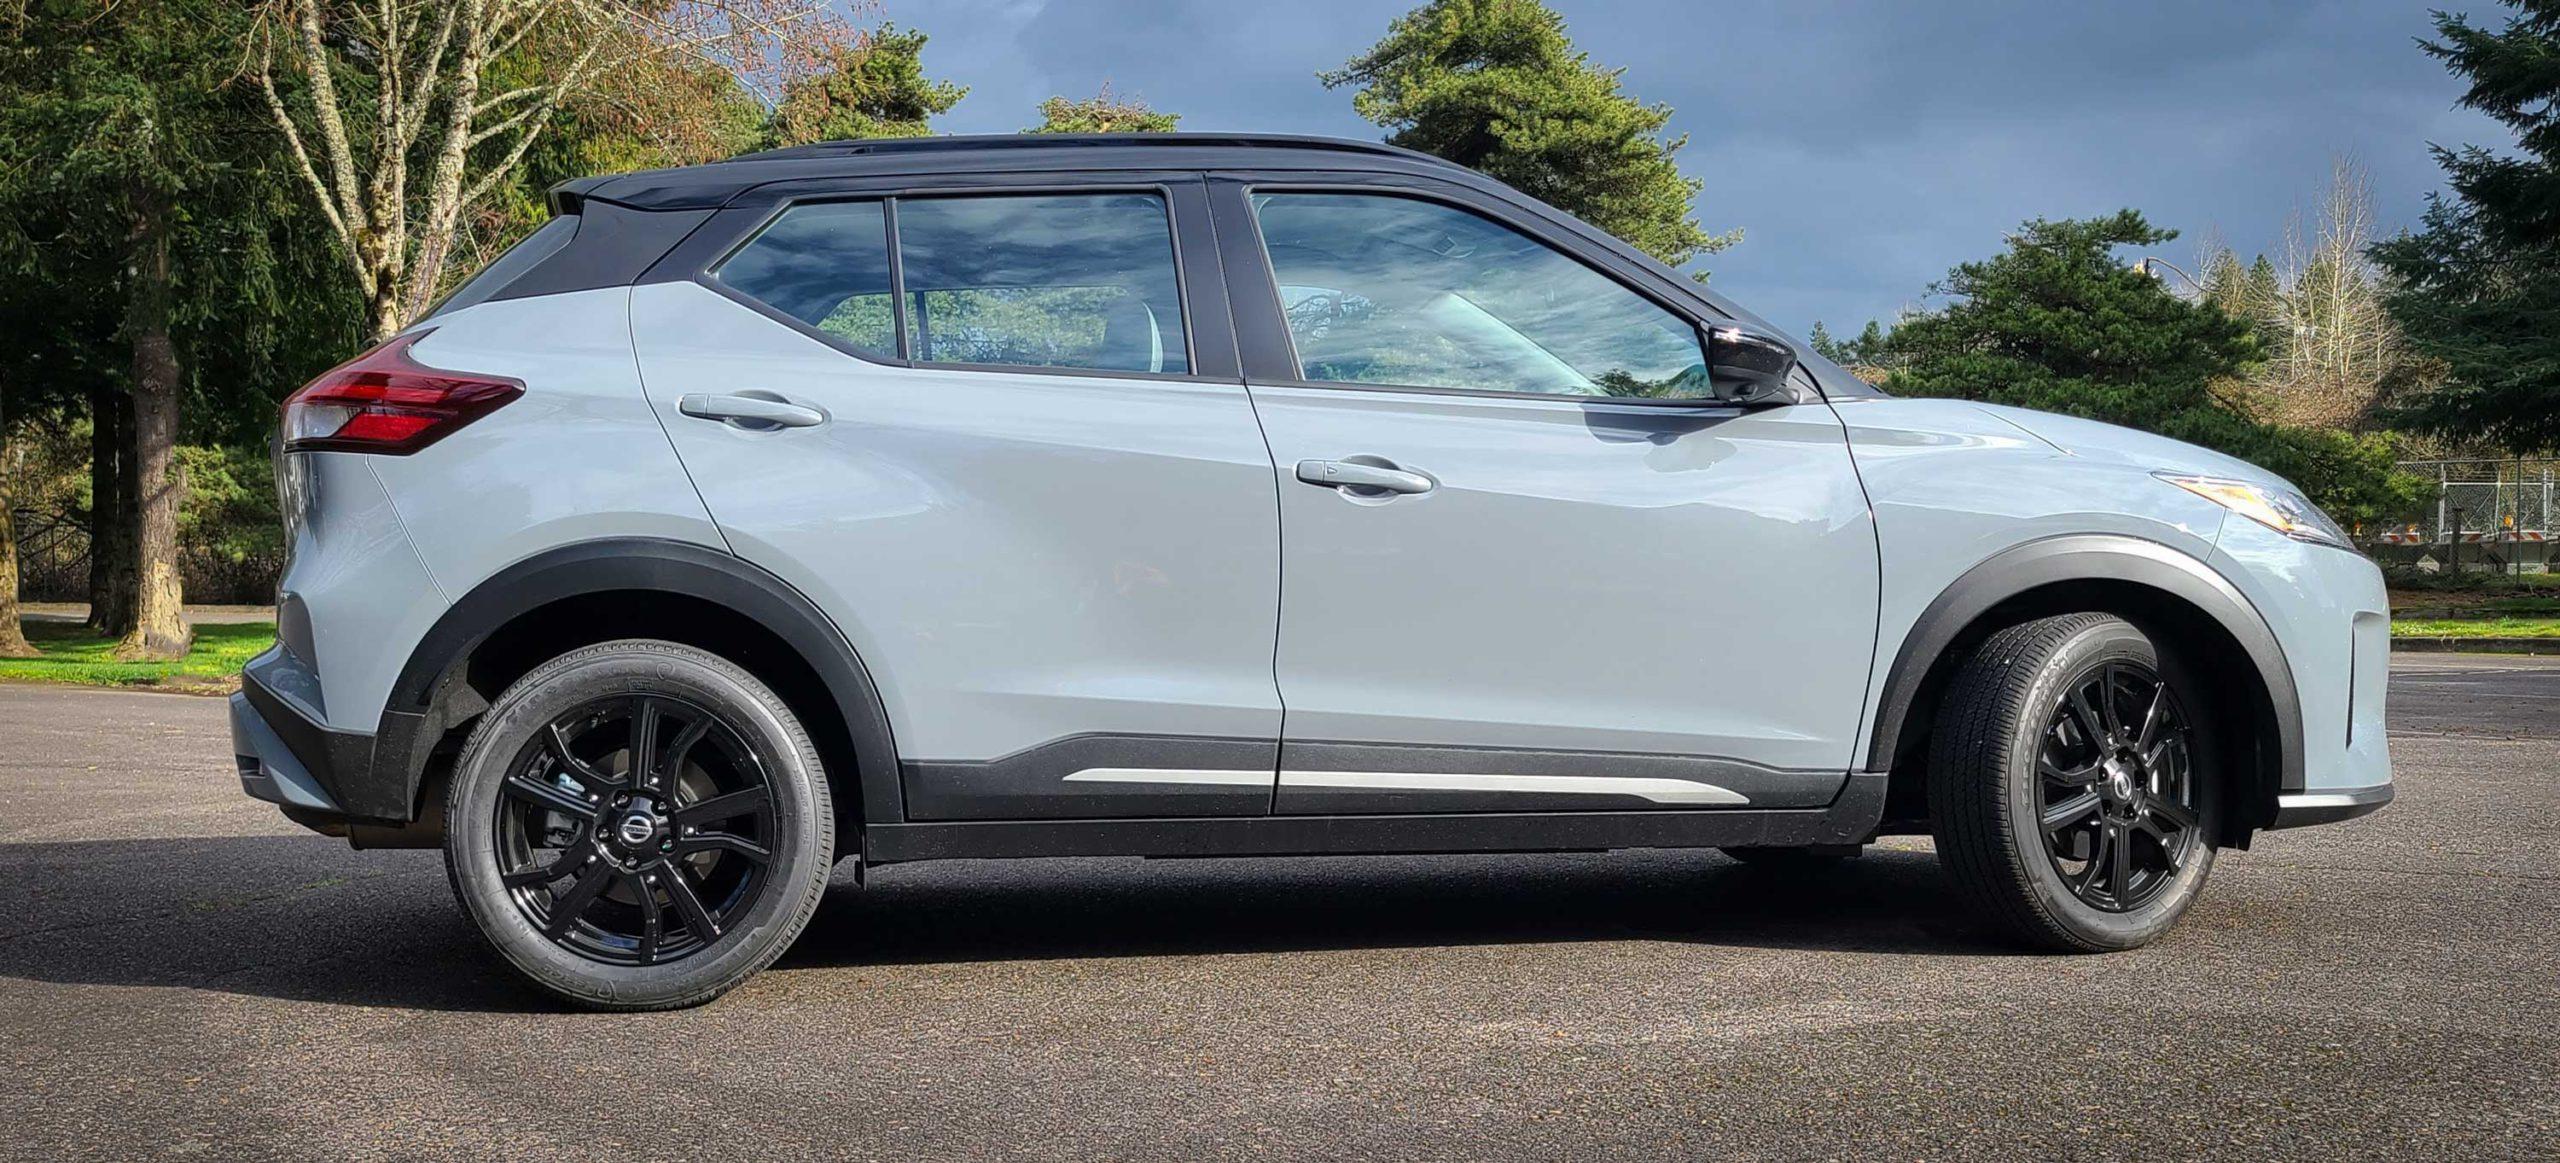 2021 Nissan Kicks SR side shot